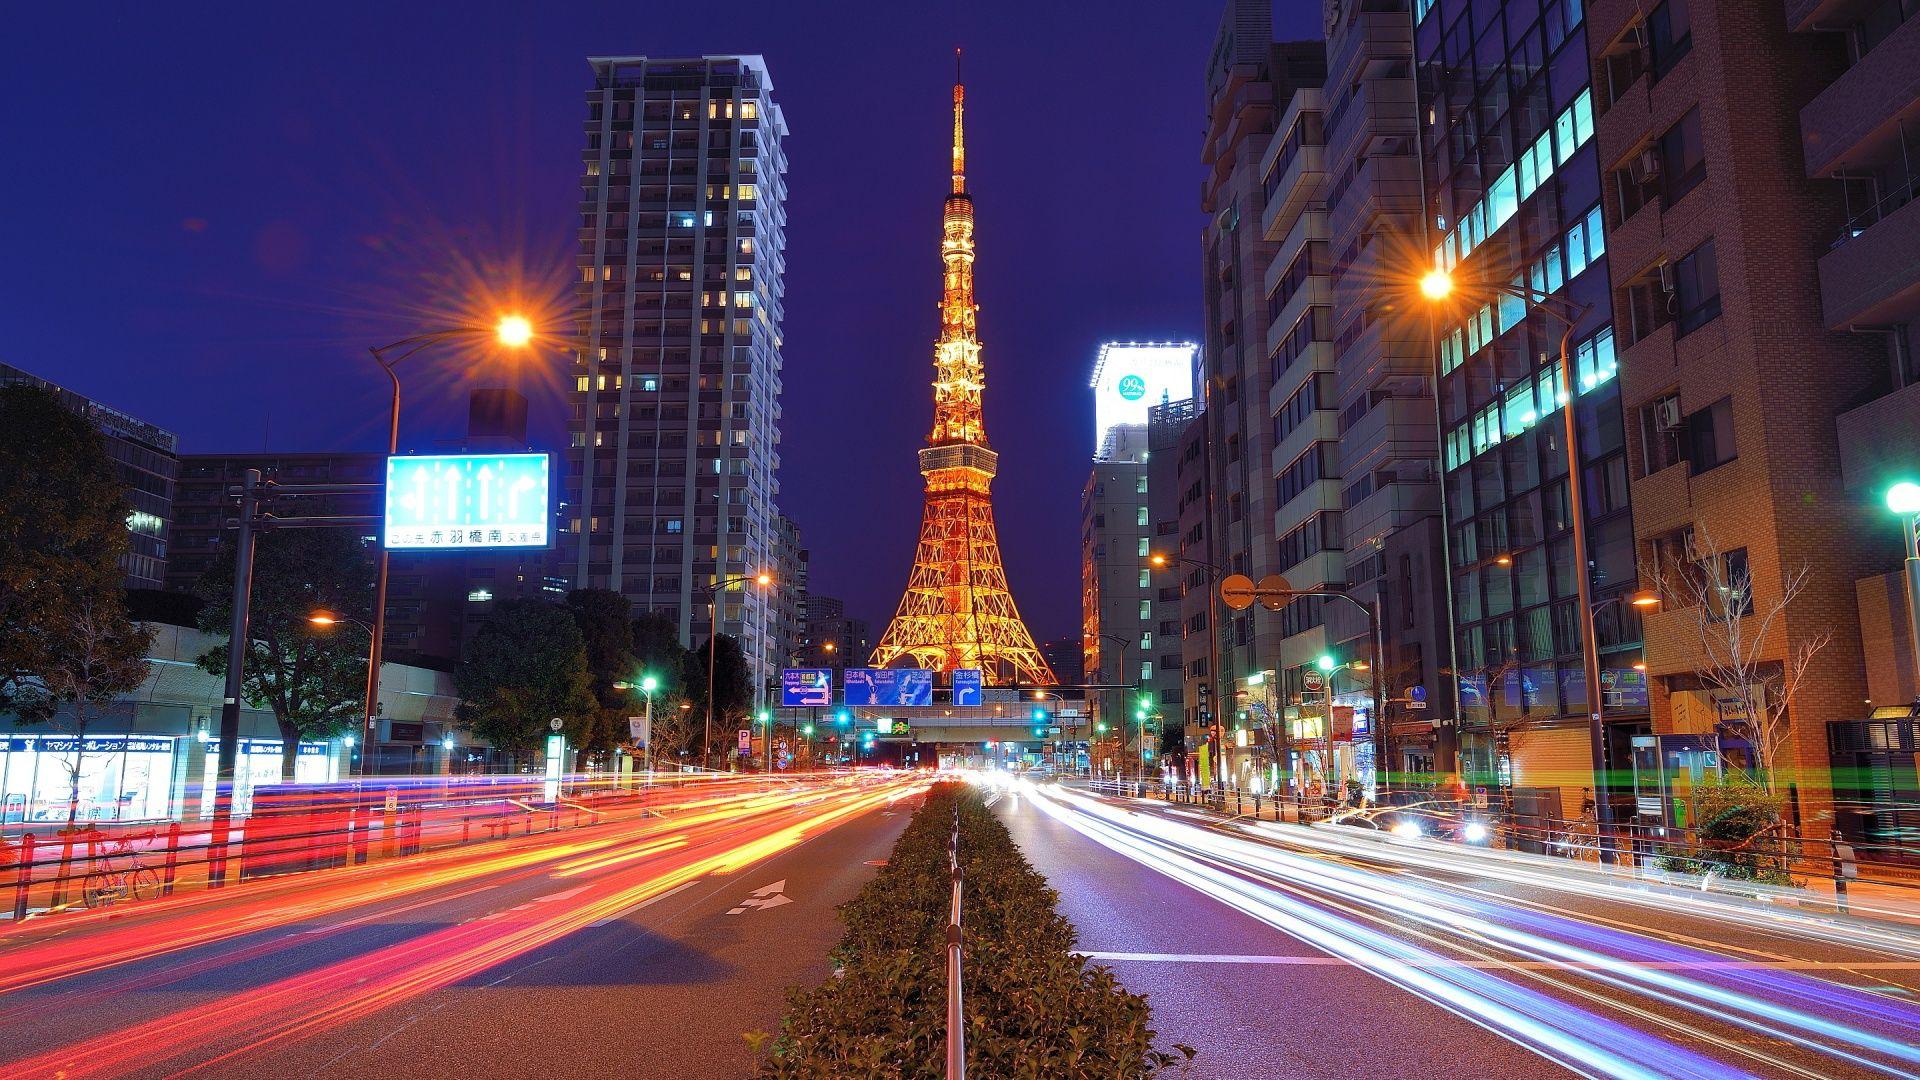 City Wallpaper Tokyo Night Wallpaper Hd Resolution Free Download Tokyo Tower City Wallpaper Tokyo Night